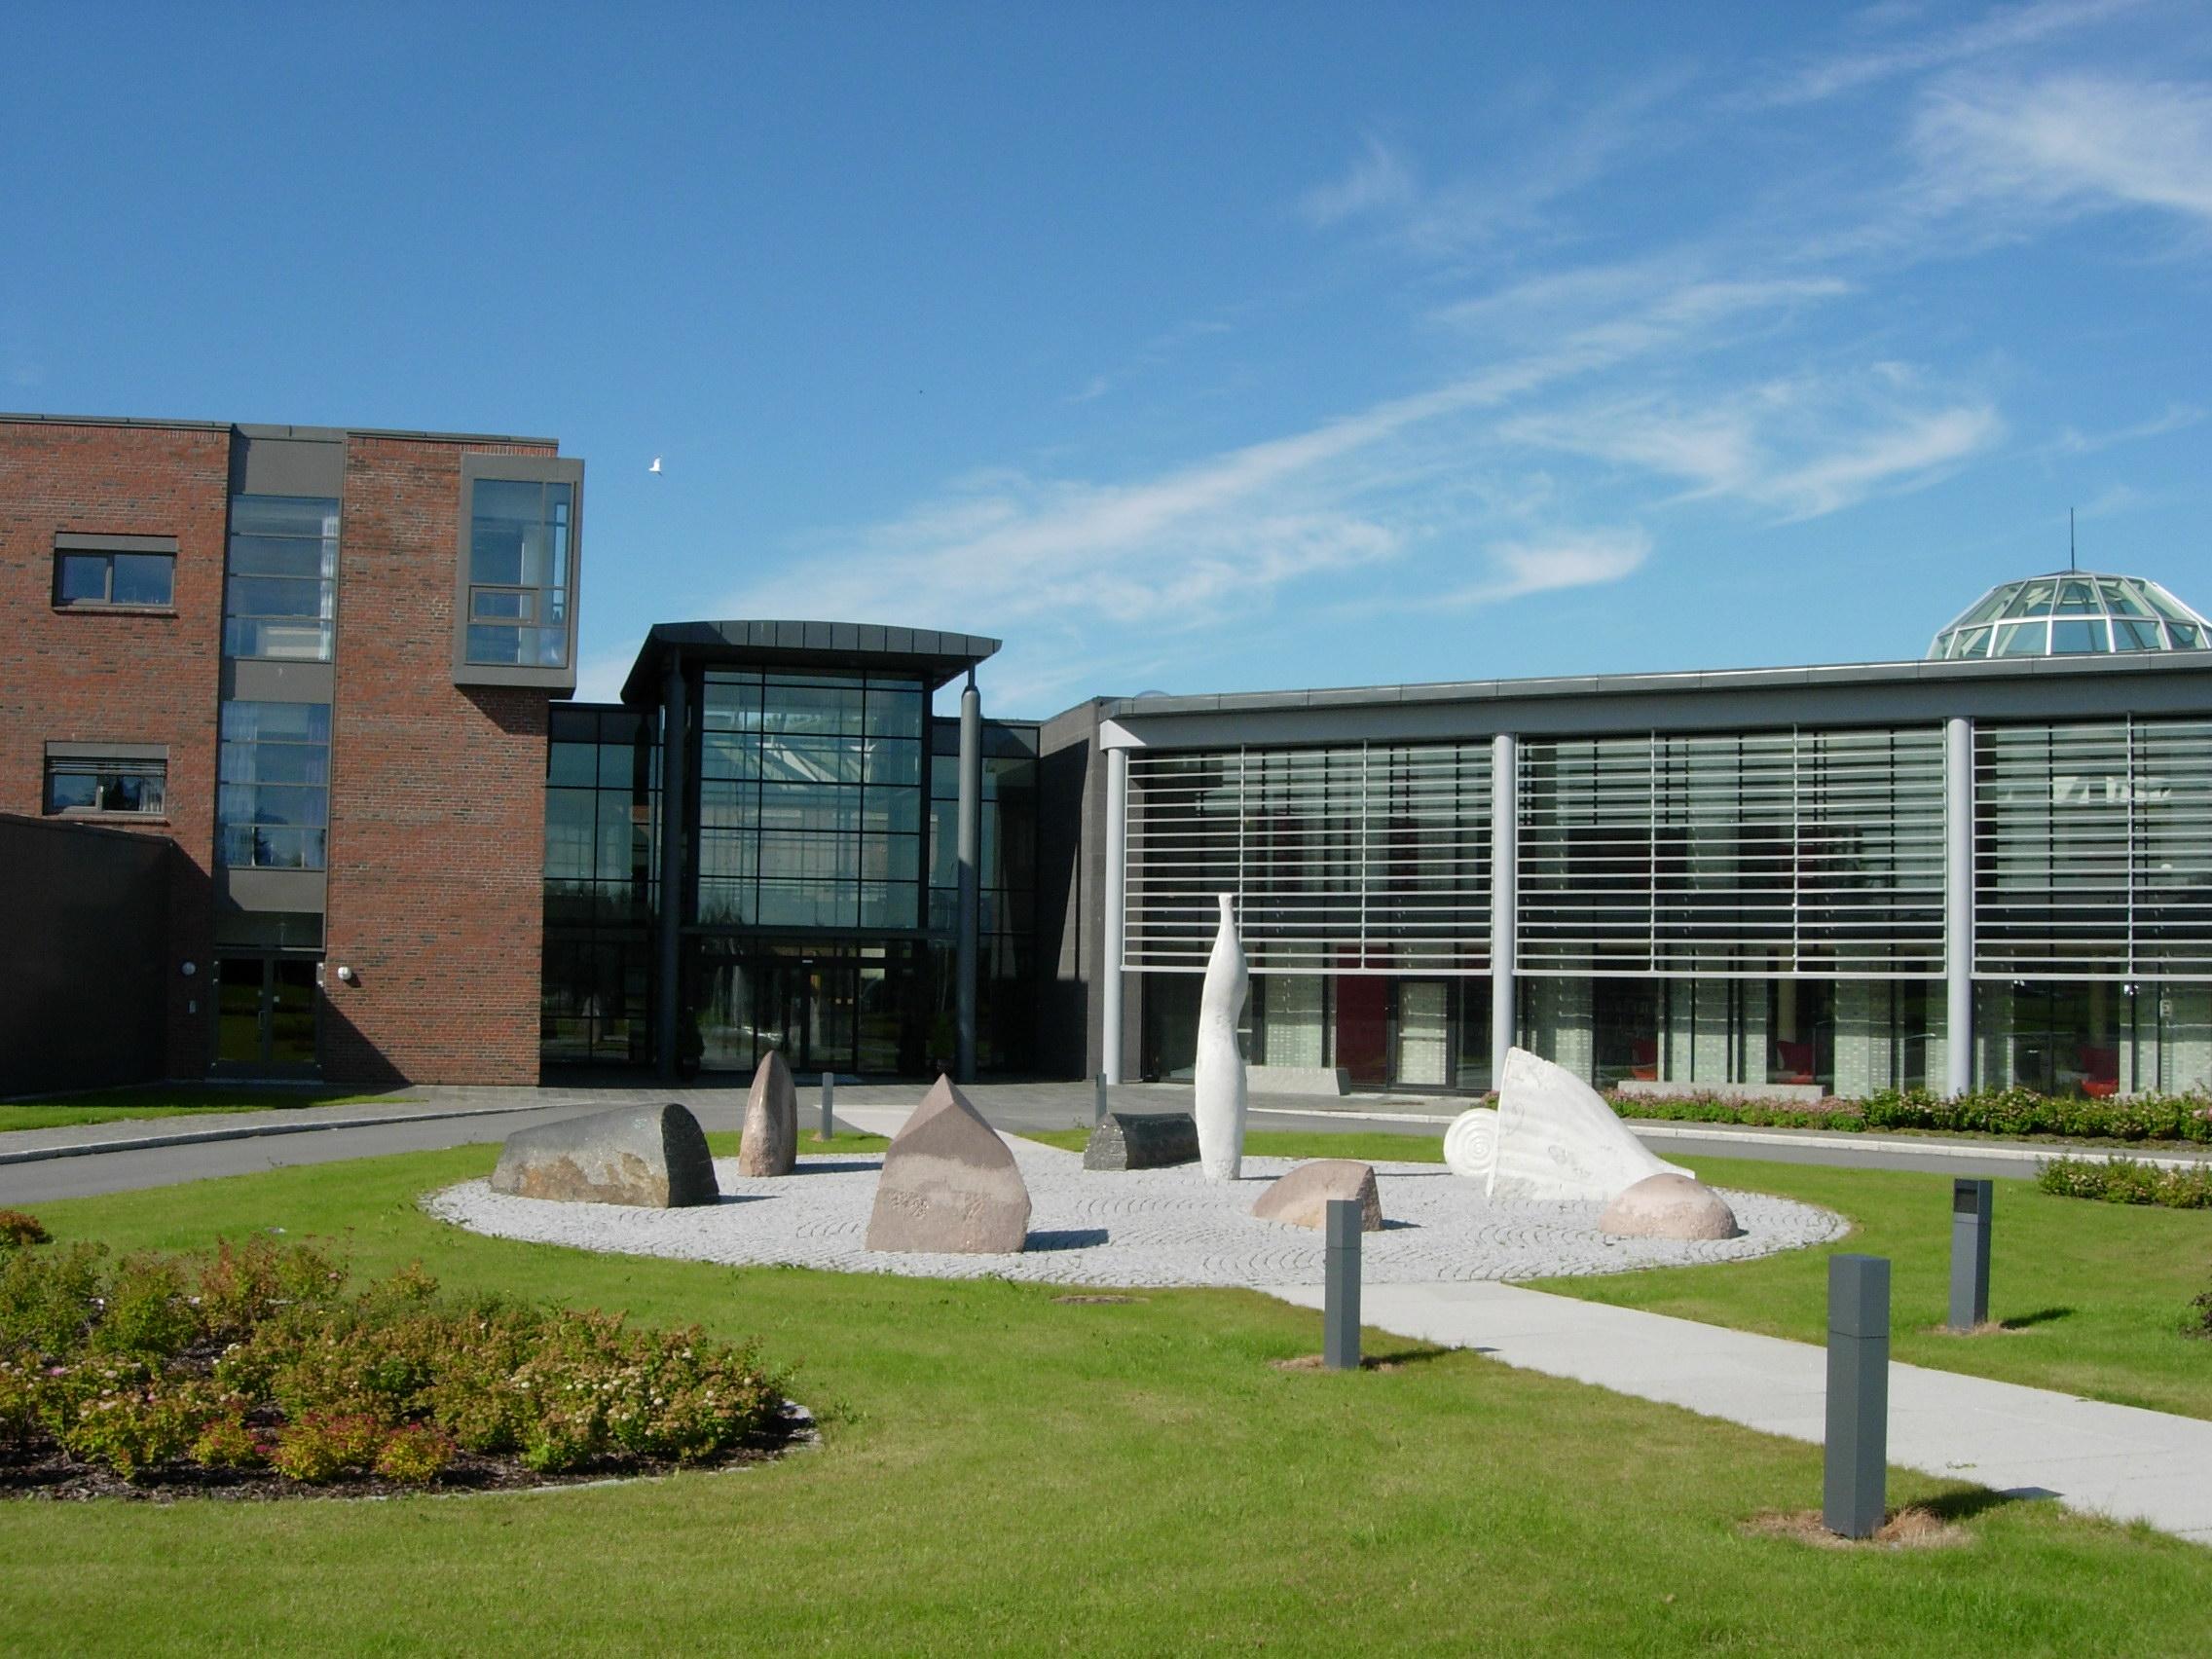 nord universitet